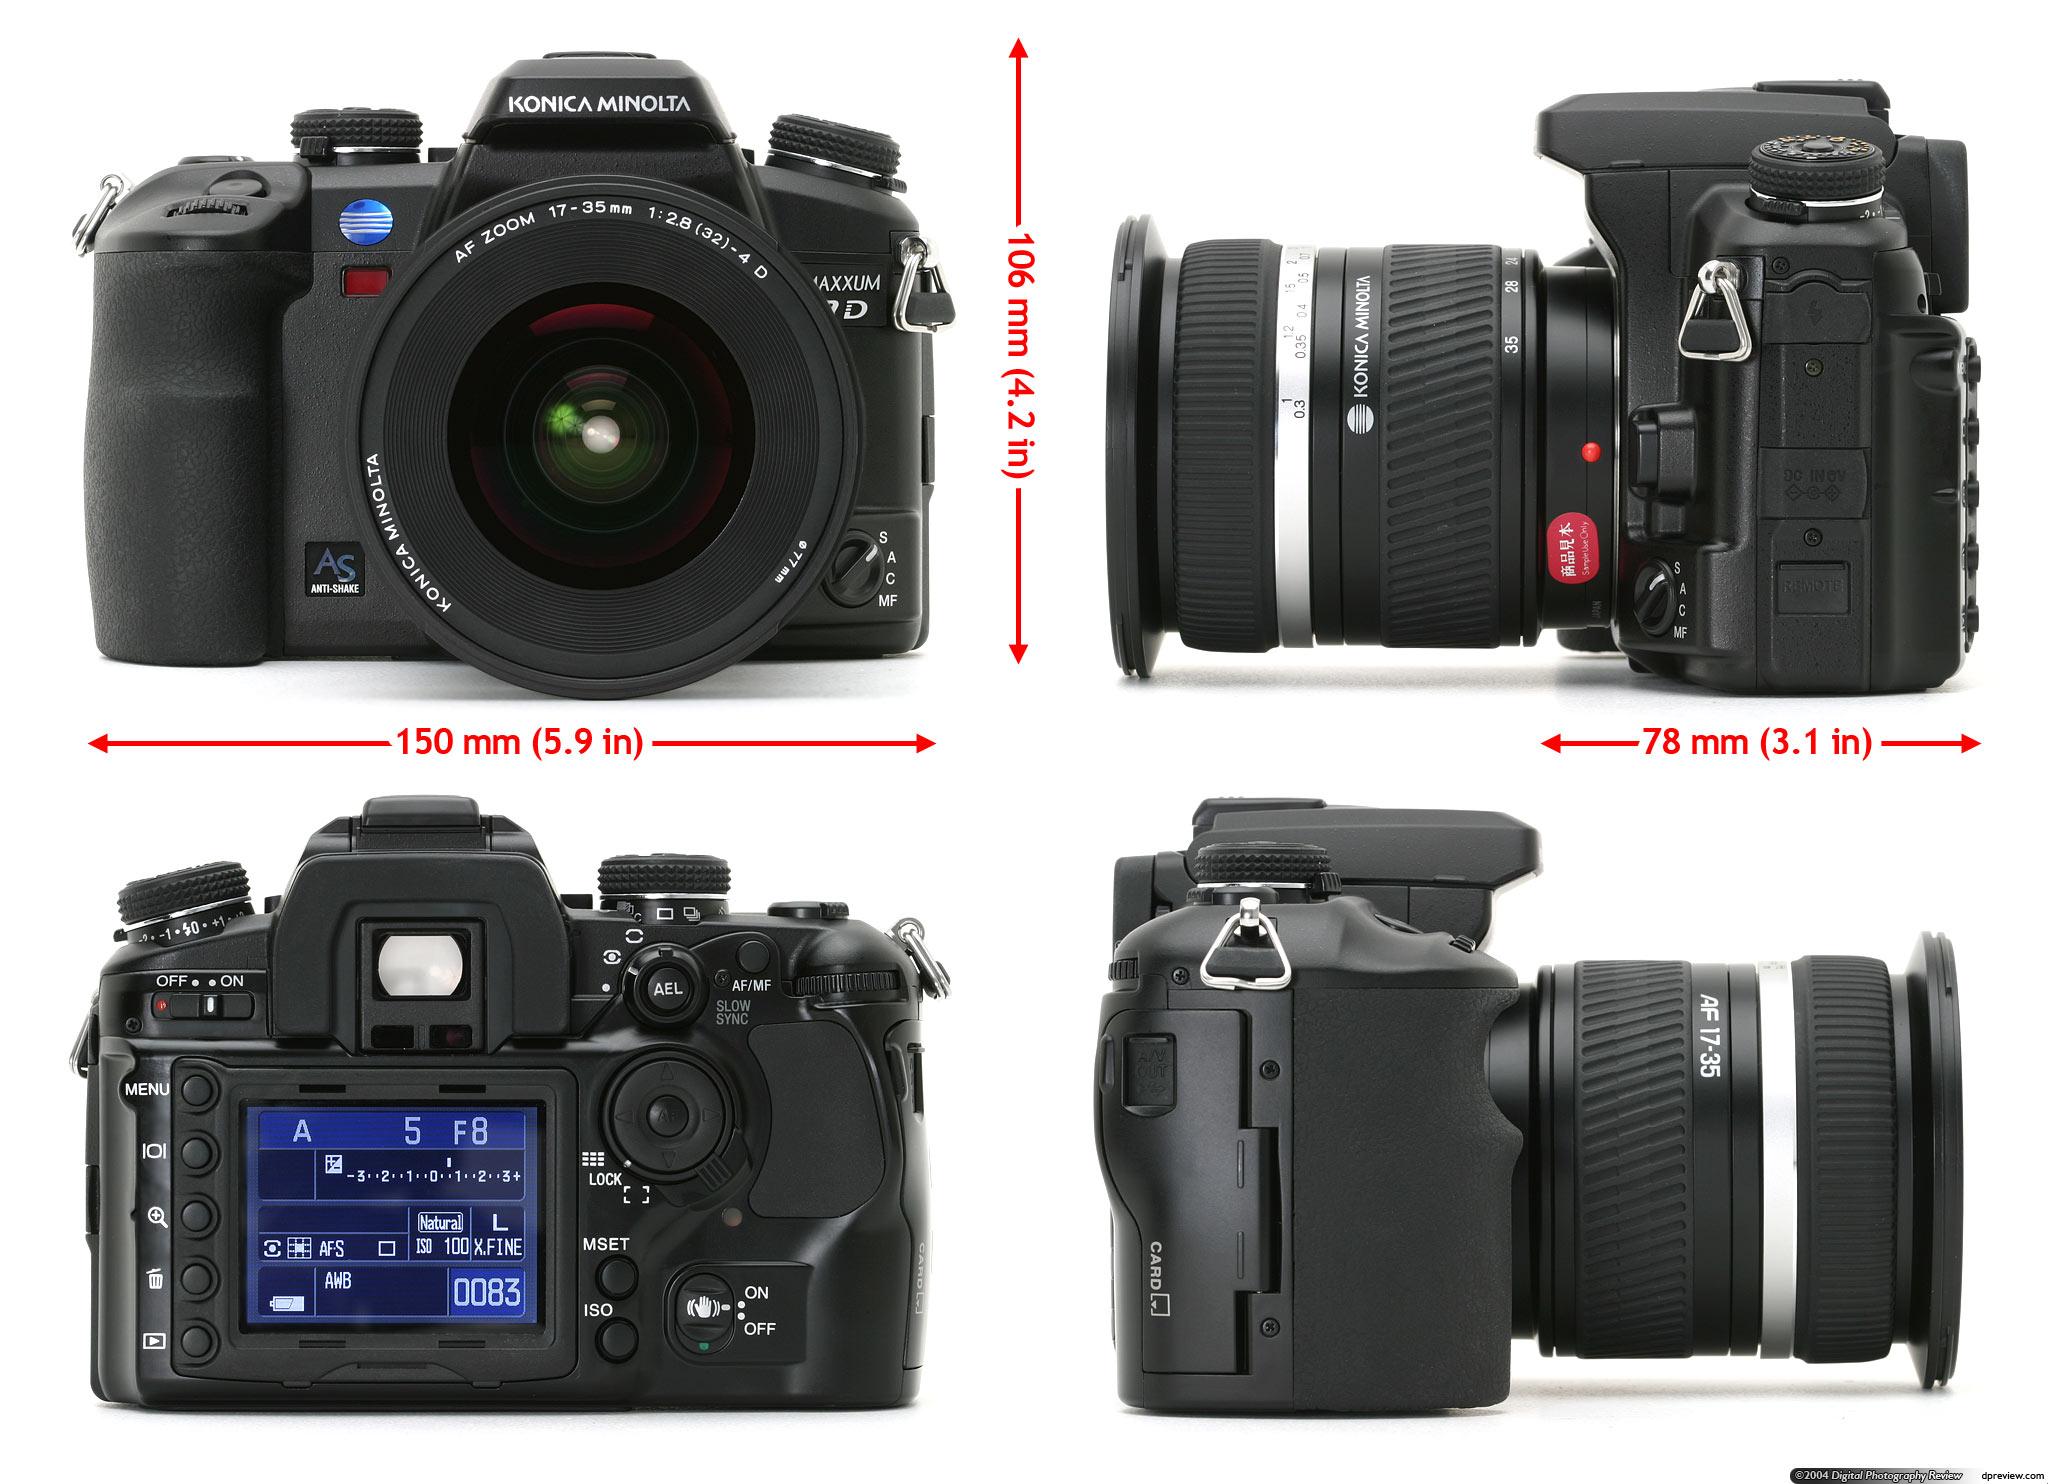 Konica Minolta Dynax 7D - 6.3 MP, APS-C CCD sensor, ISO 100-1600,pentaprism view finder, 2.5